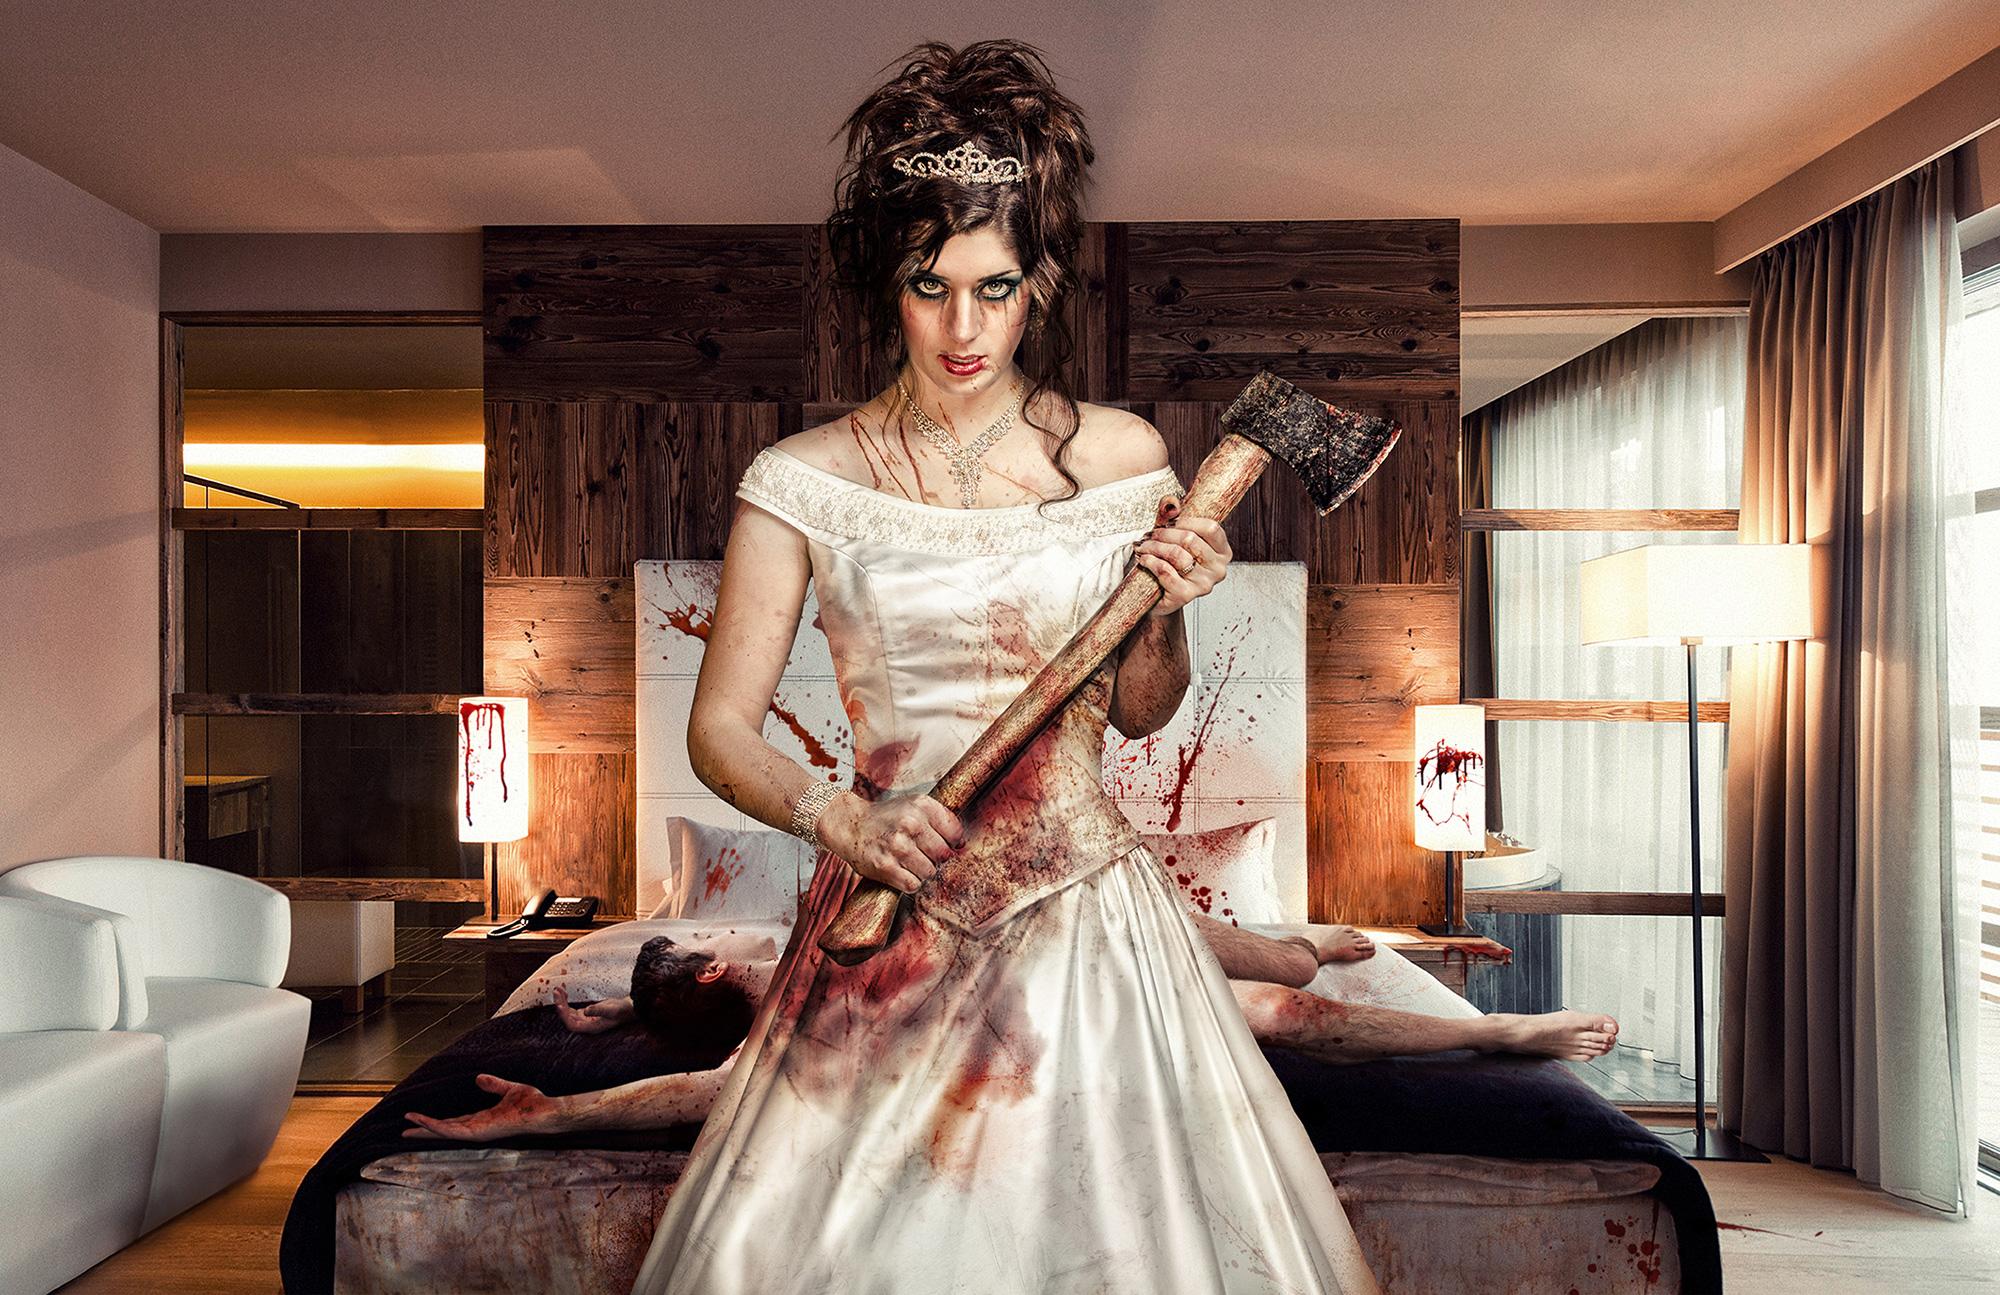 honeymoon nuit de noce mariée bride devil murder